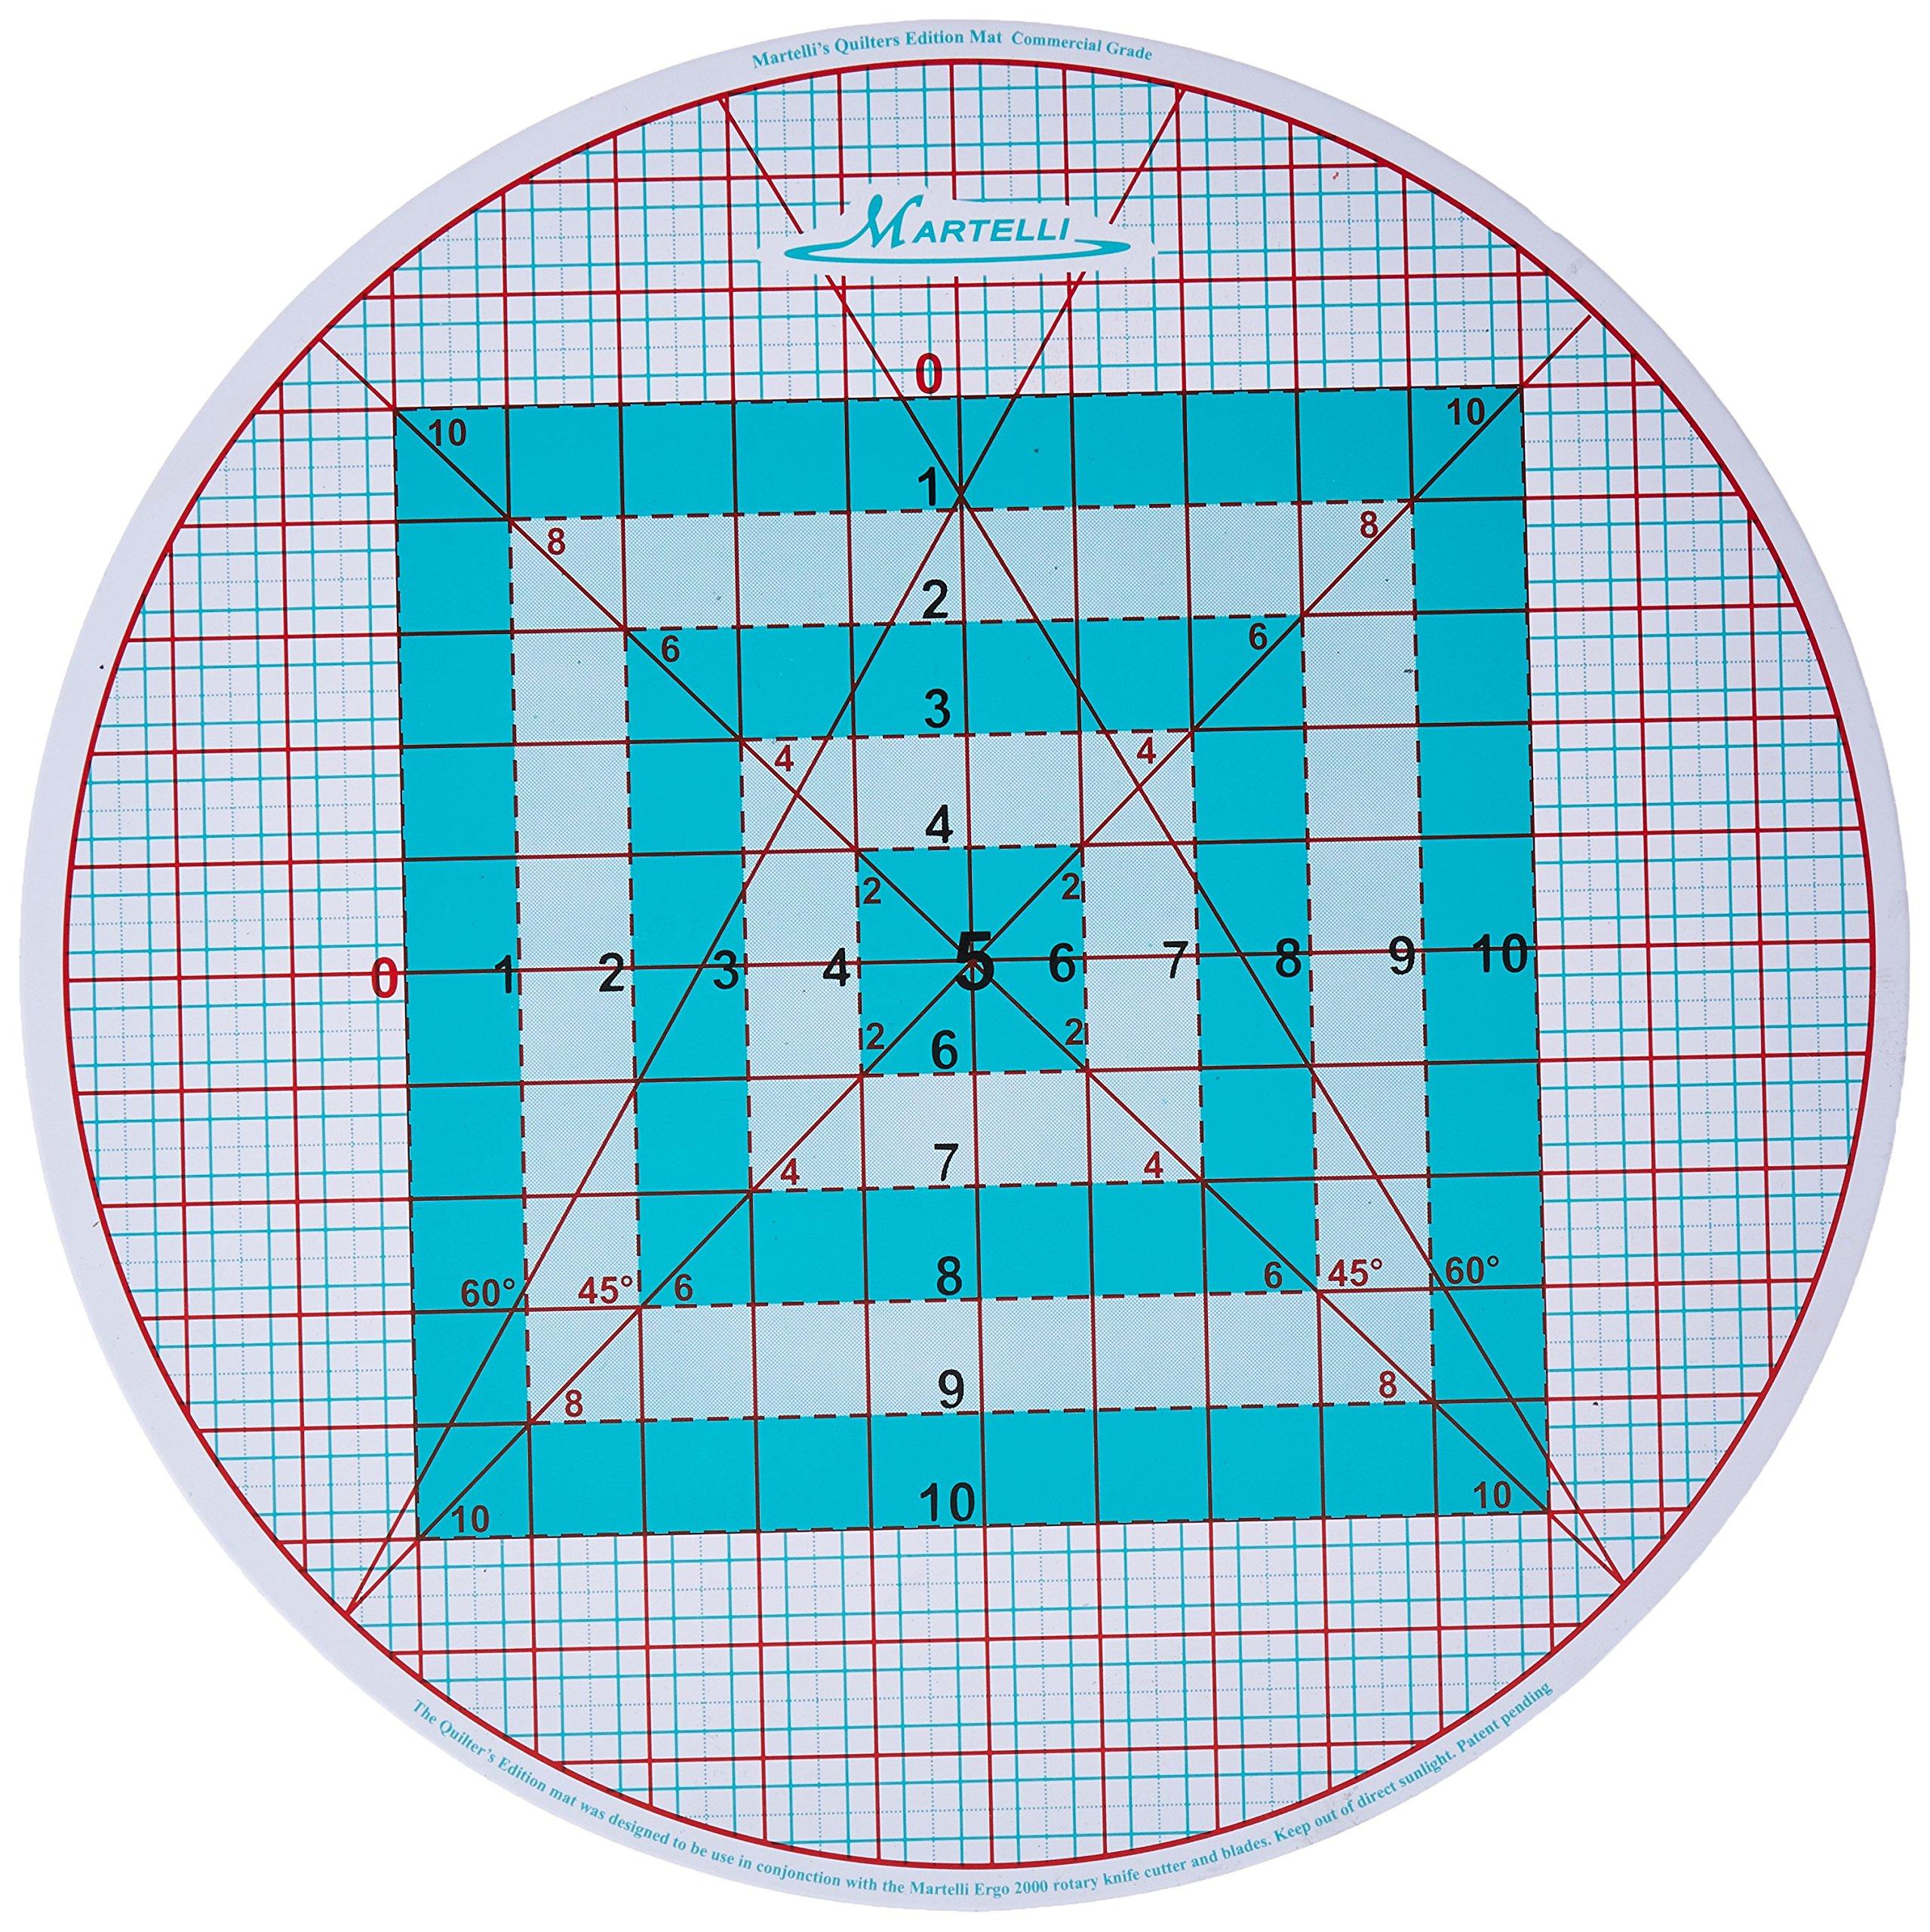 Martelli Turn Table Mat, 16-Inch